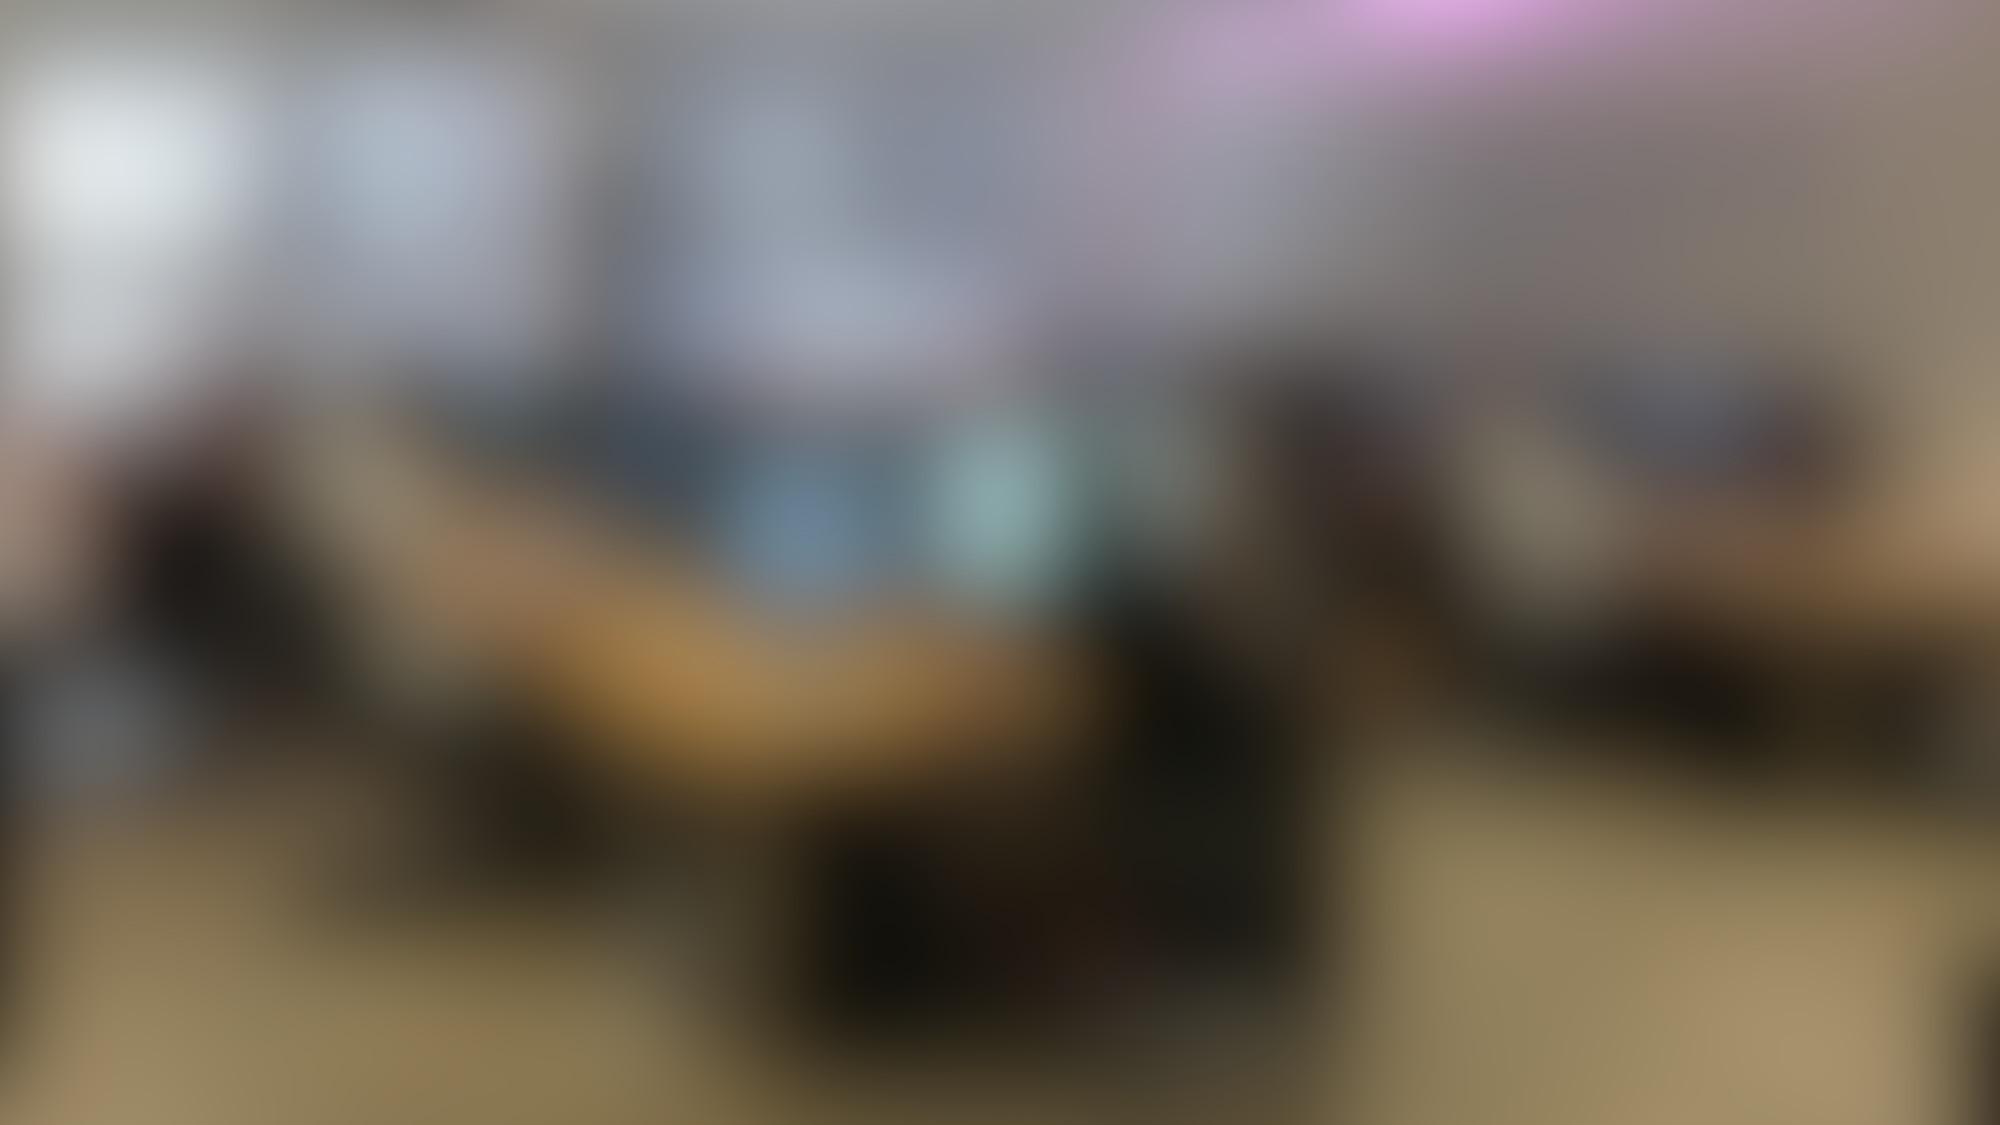 Outpost studio 06 blur autocompressfitresizeixlibphp 1 1 0max h2000max w3 D2000q80sc25de919fa71fe9144ff56a68ba24ab6